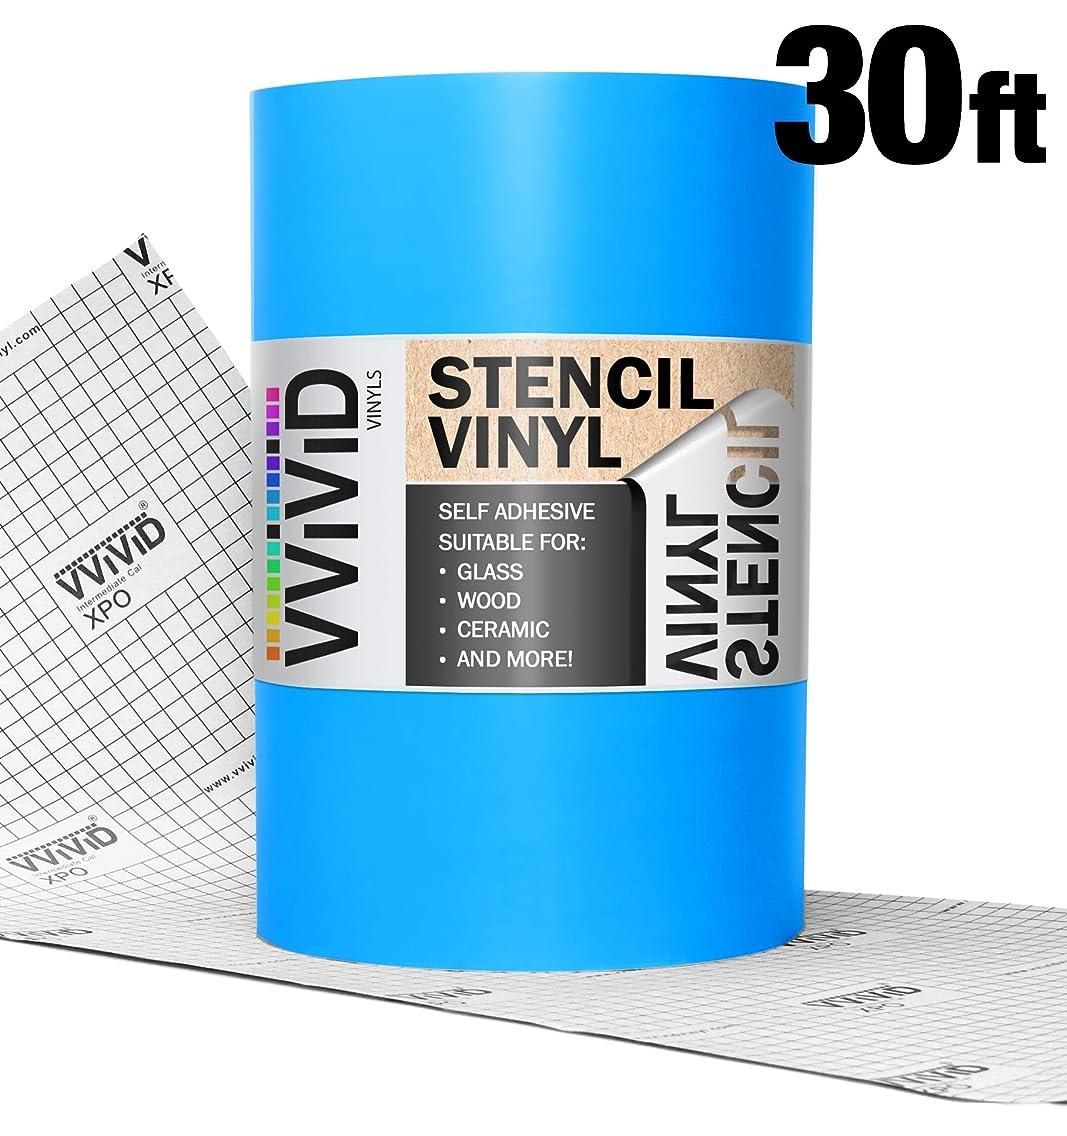 VViViD Blue Low-Tack Adhesive Vinyl Stencil Masking Film 24